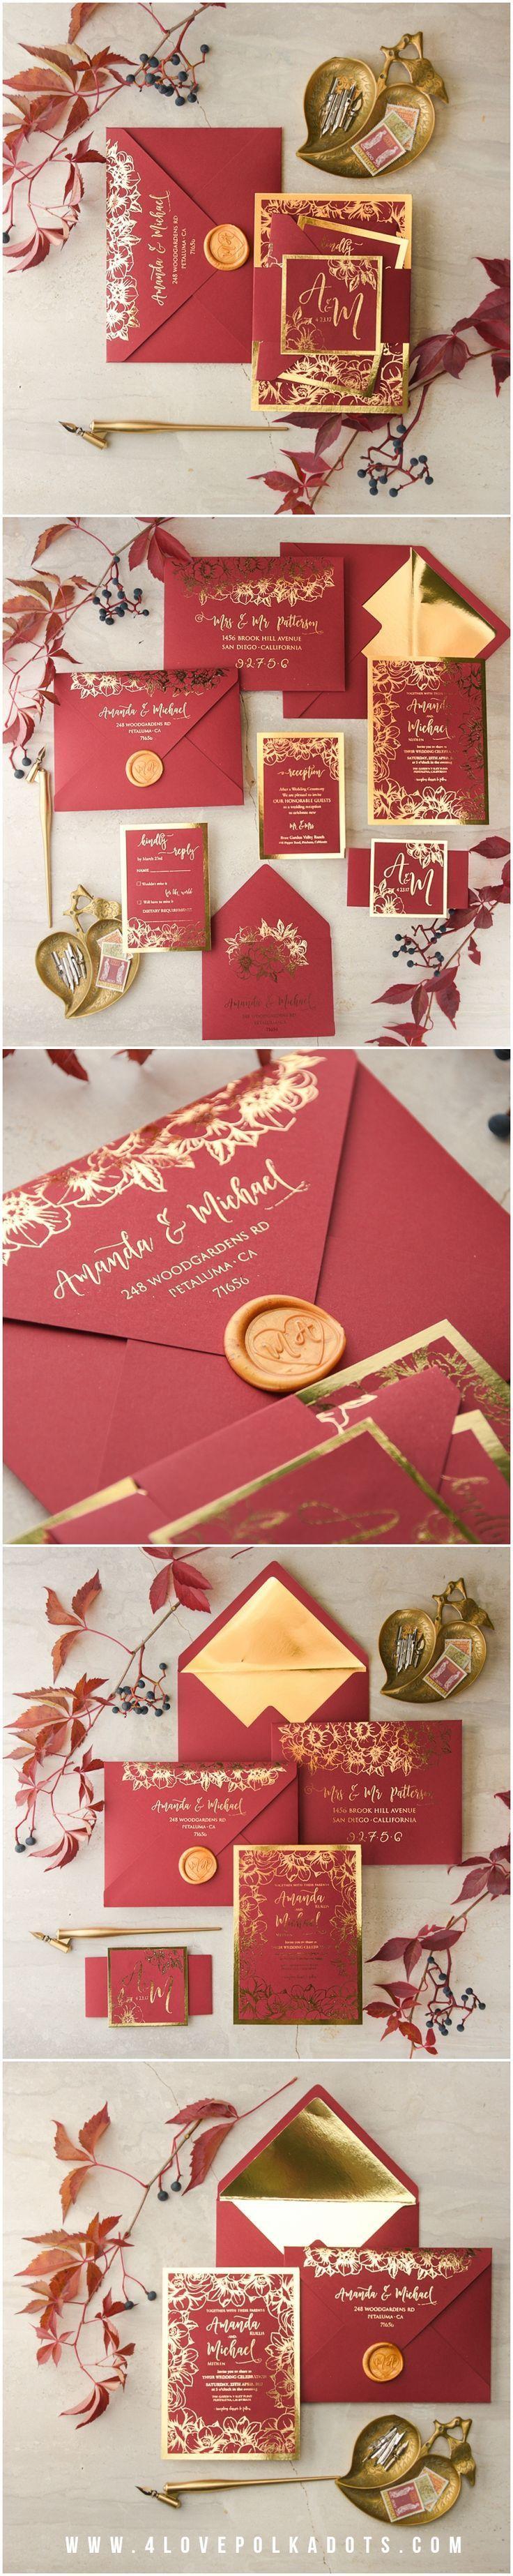 Marsala & Gold Wedding Invitations - Gold foil printing, wax ...